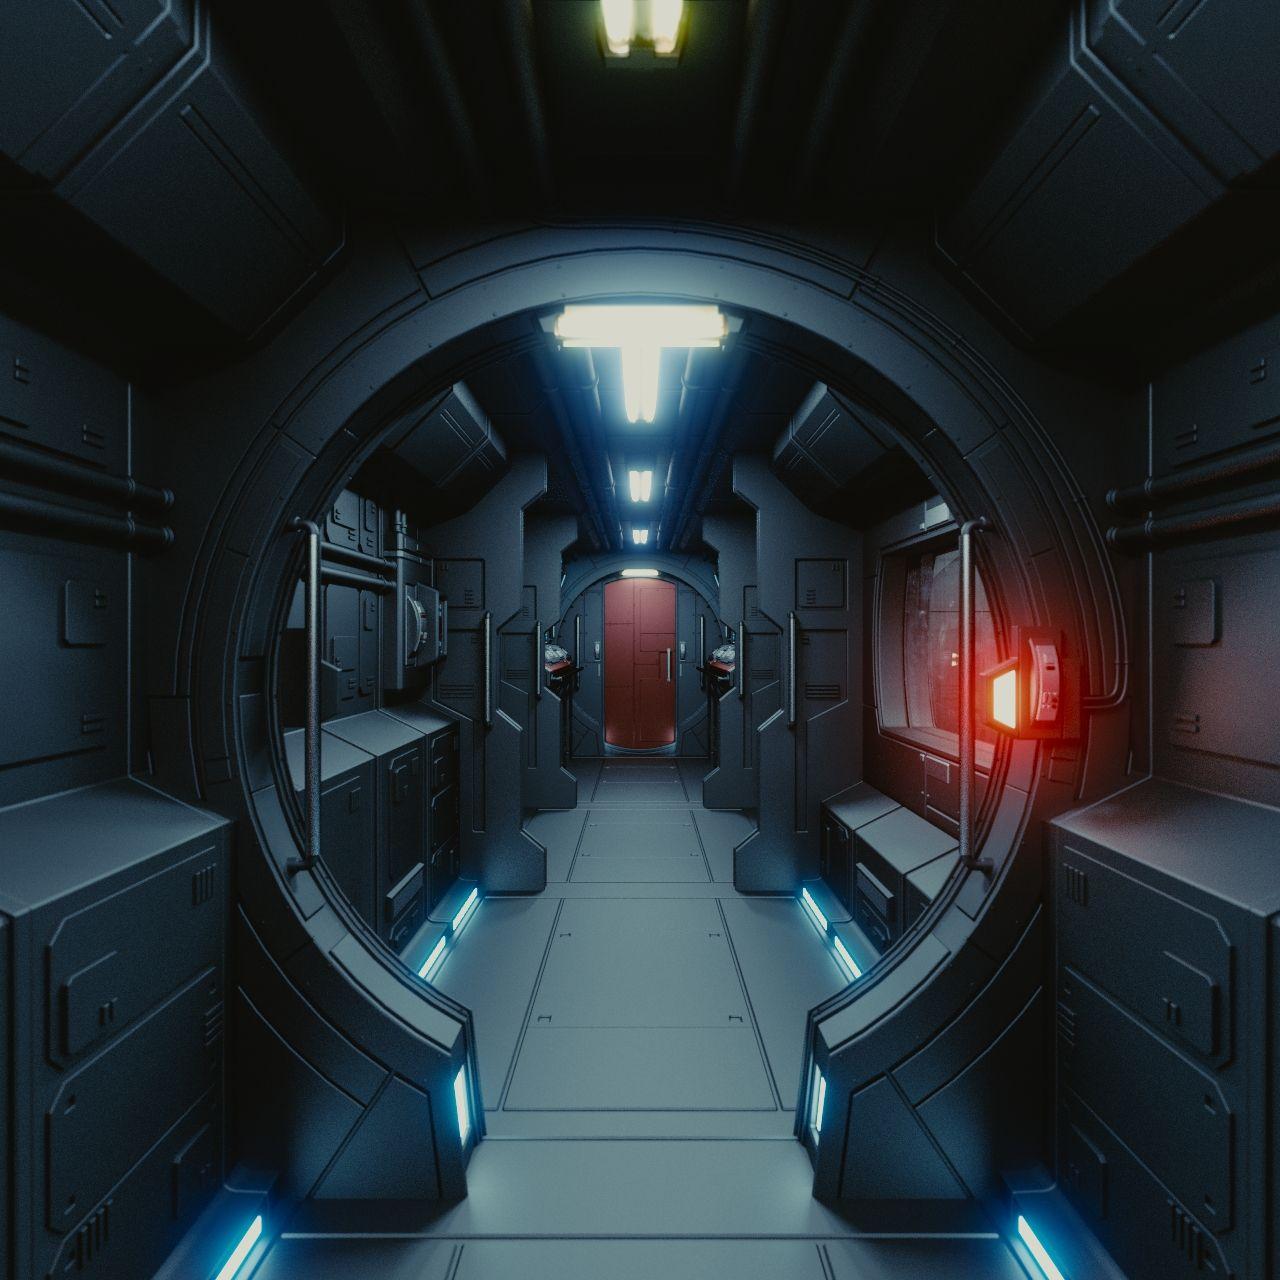 Dan Brown CGI | Sci-fi Art | Intérieur vaisseau spatial ...